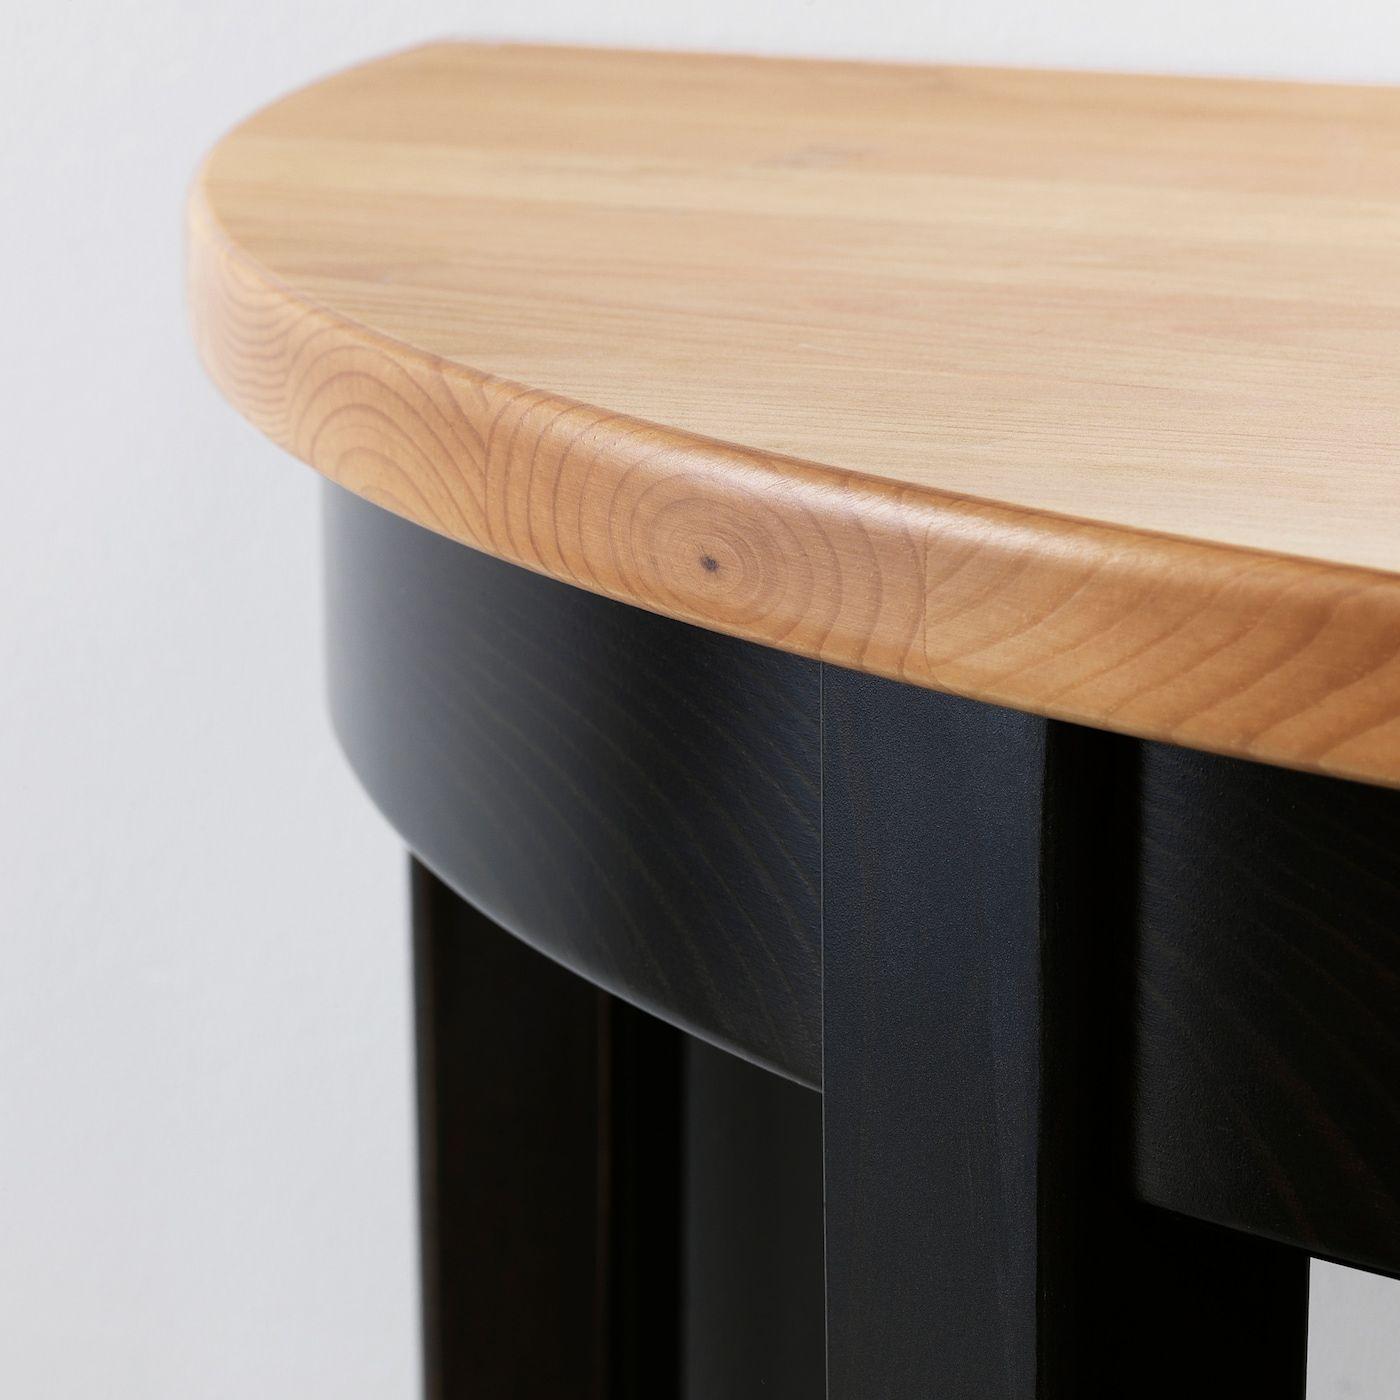 Arkelstorp Fenstertisch Schwarz 80x40x75 Cm Ikea Osterreich In 2021 Window Table Black Console Table Console Table [ 1400 x 1400 Pixel ]